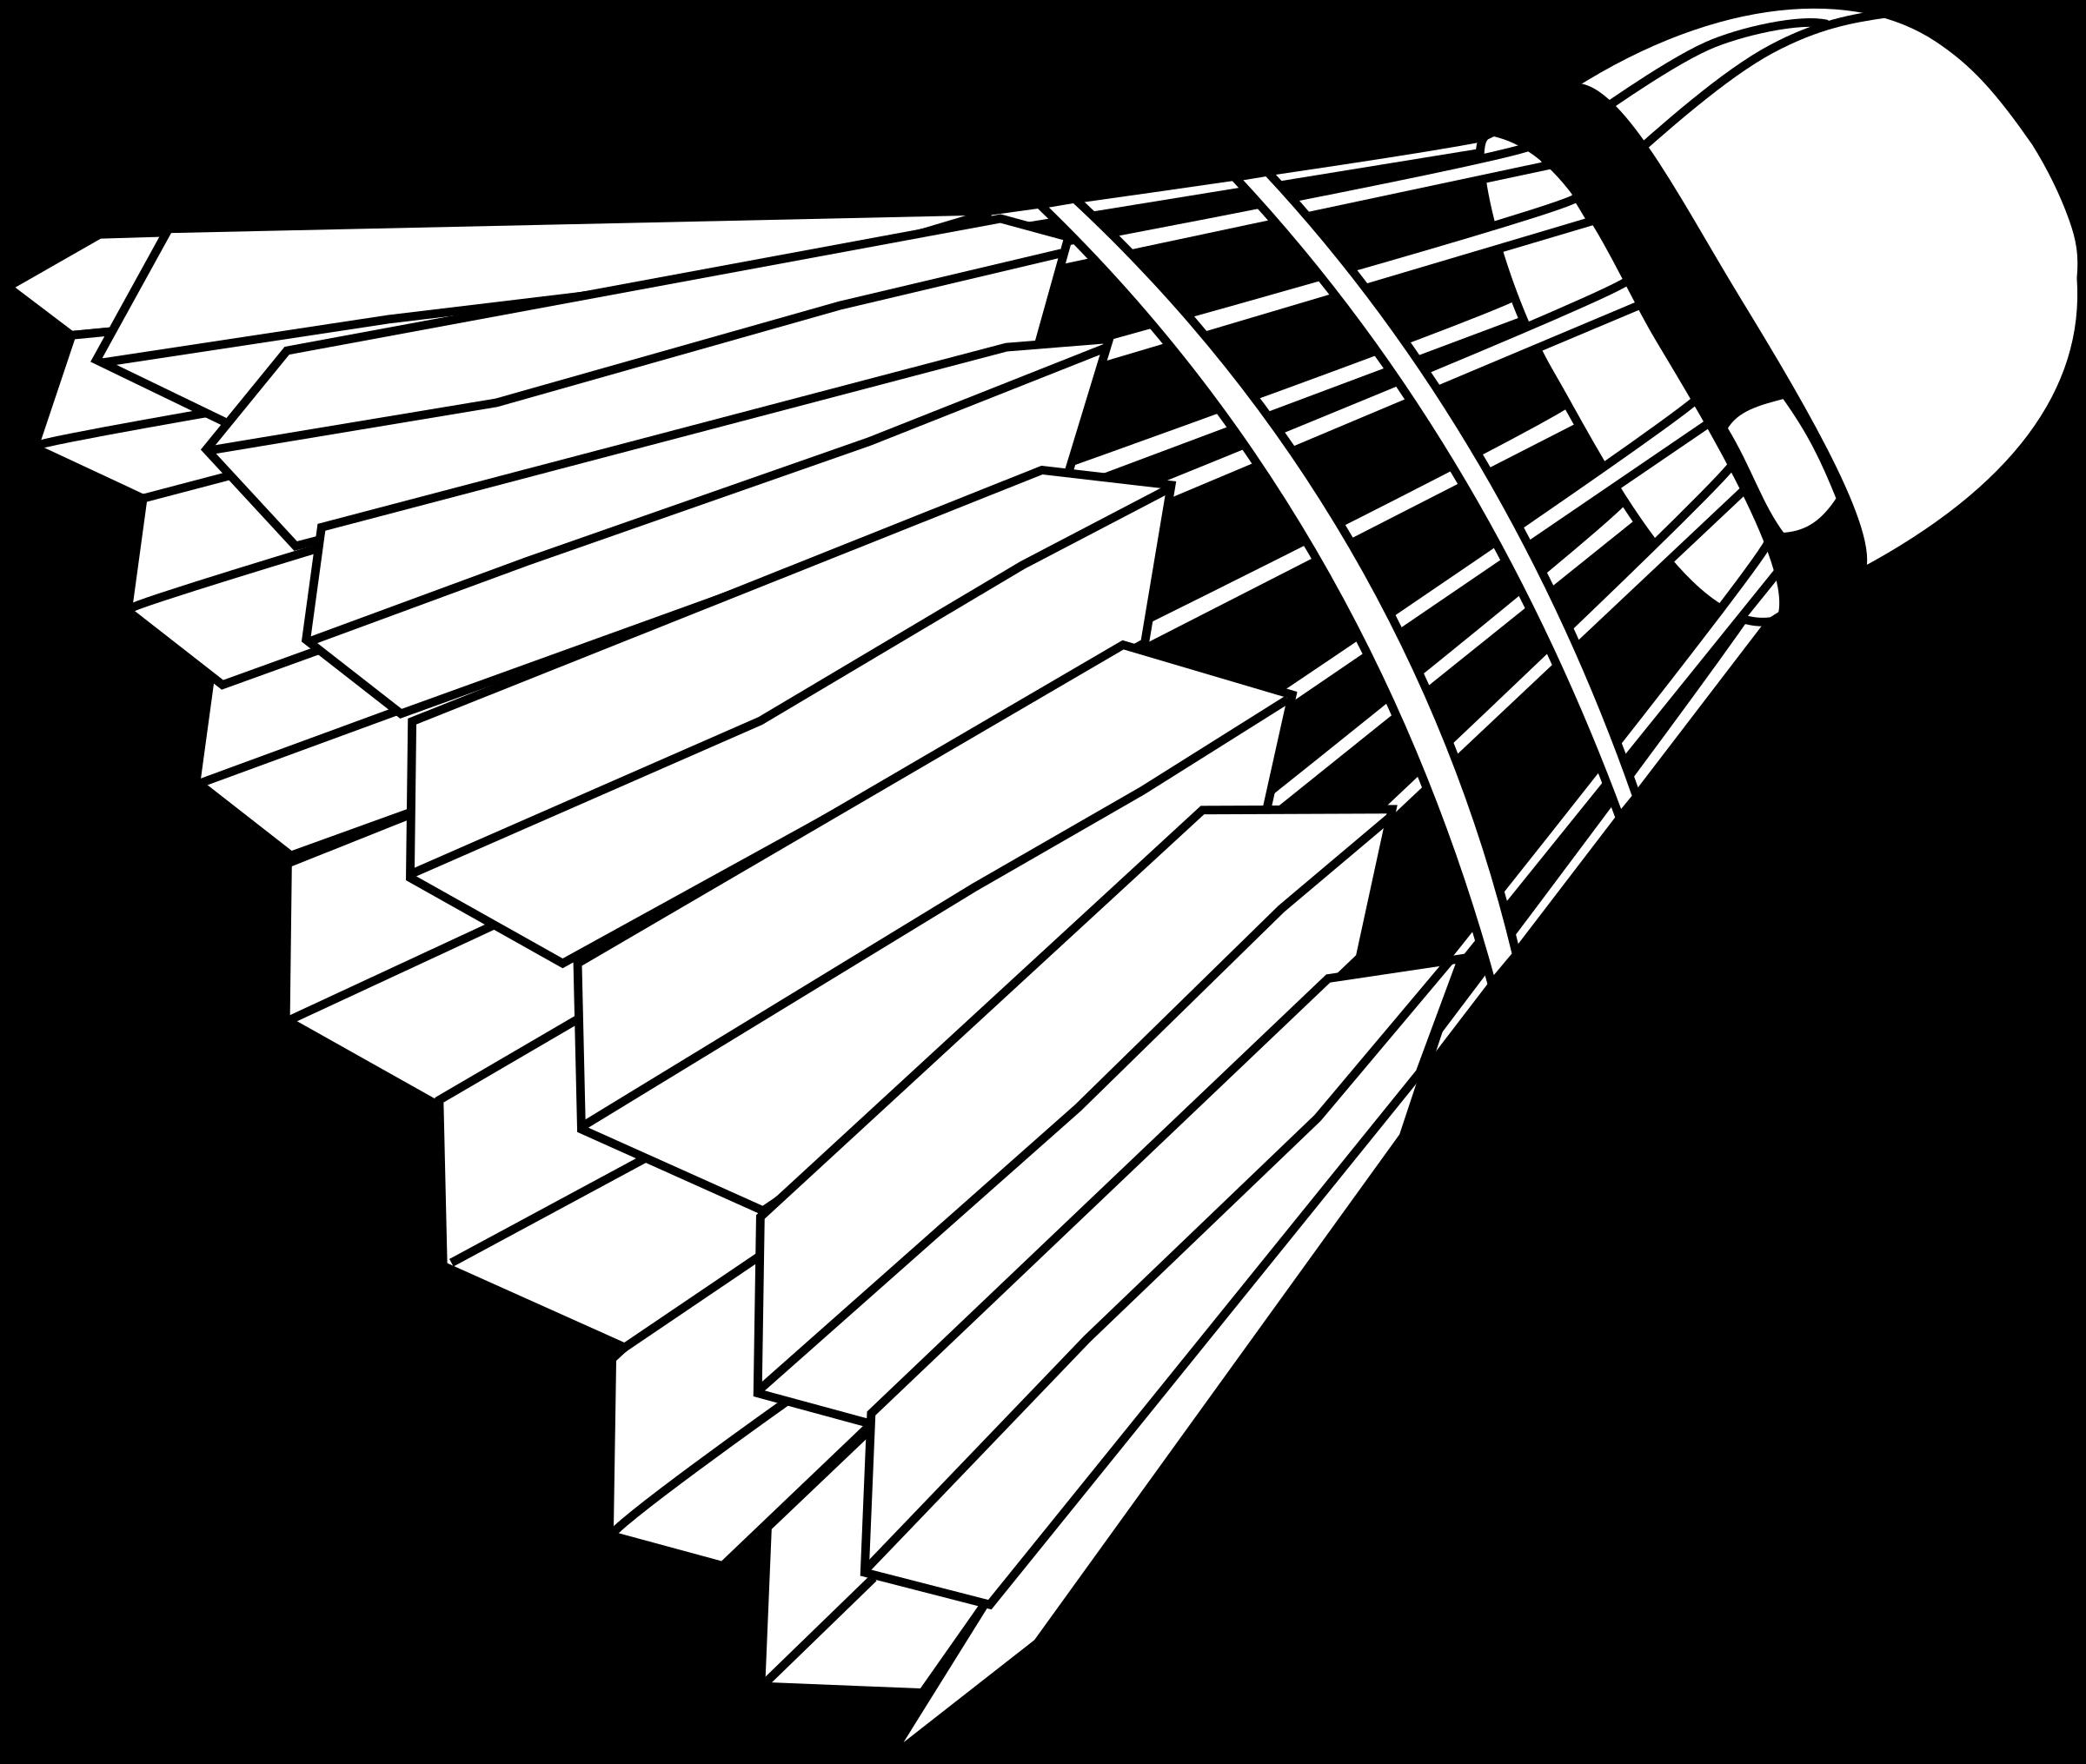 clip art download Badminton clipart badminton birdie. Shuttlecock big image png.